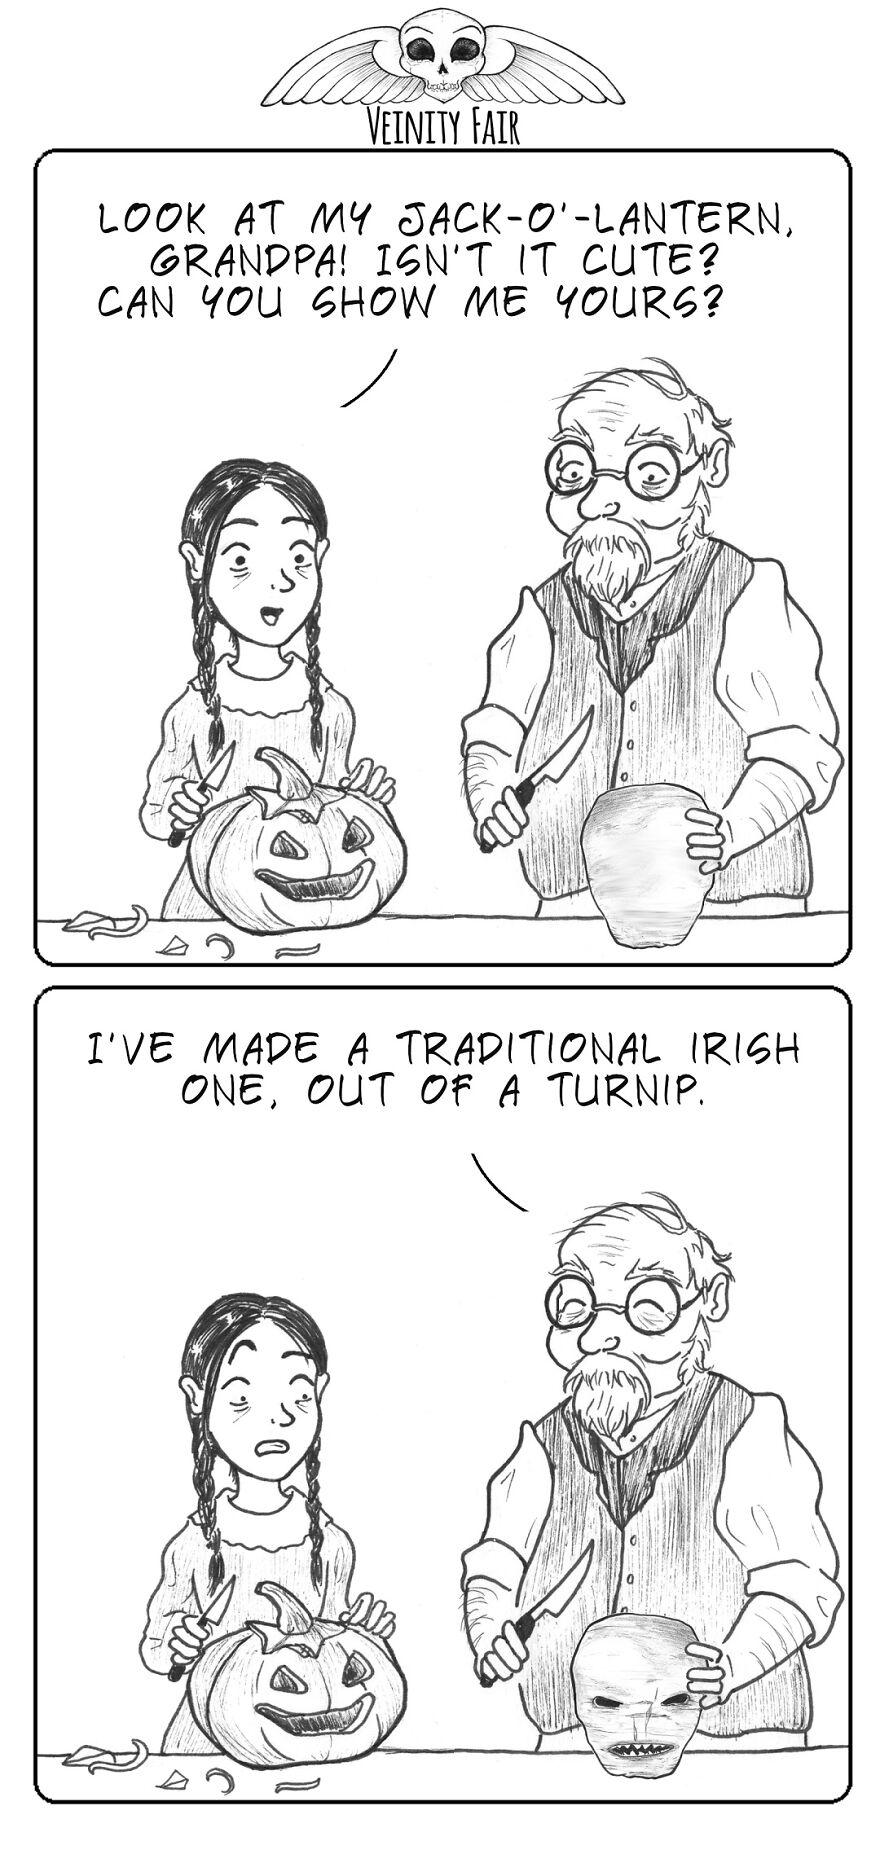 Irish Jack-O'lanterns